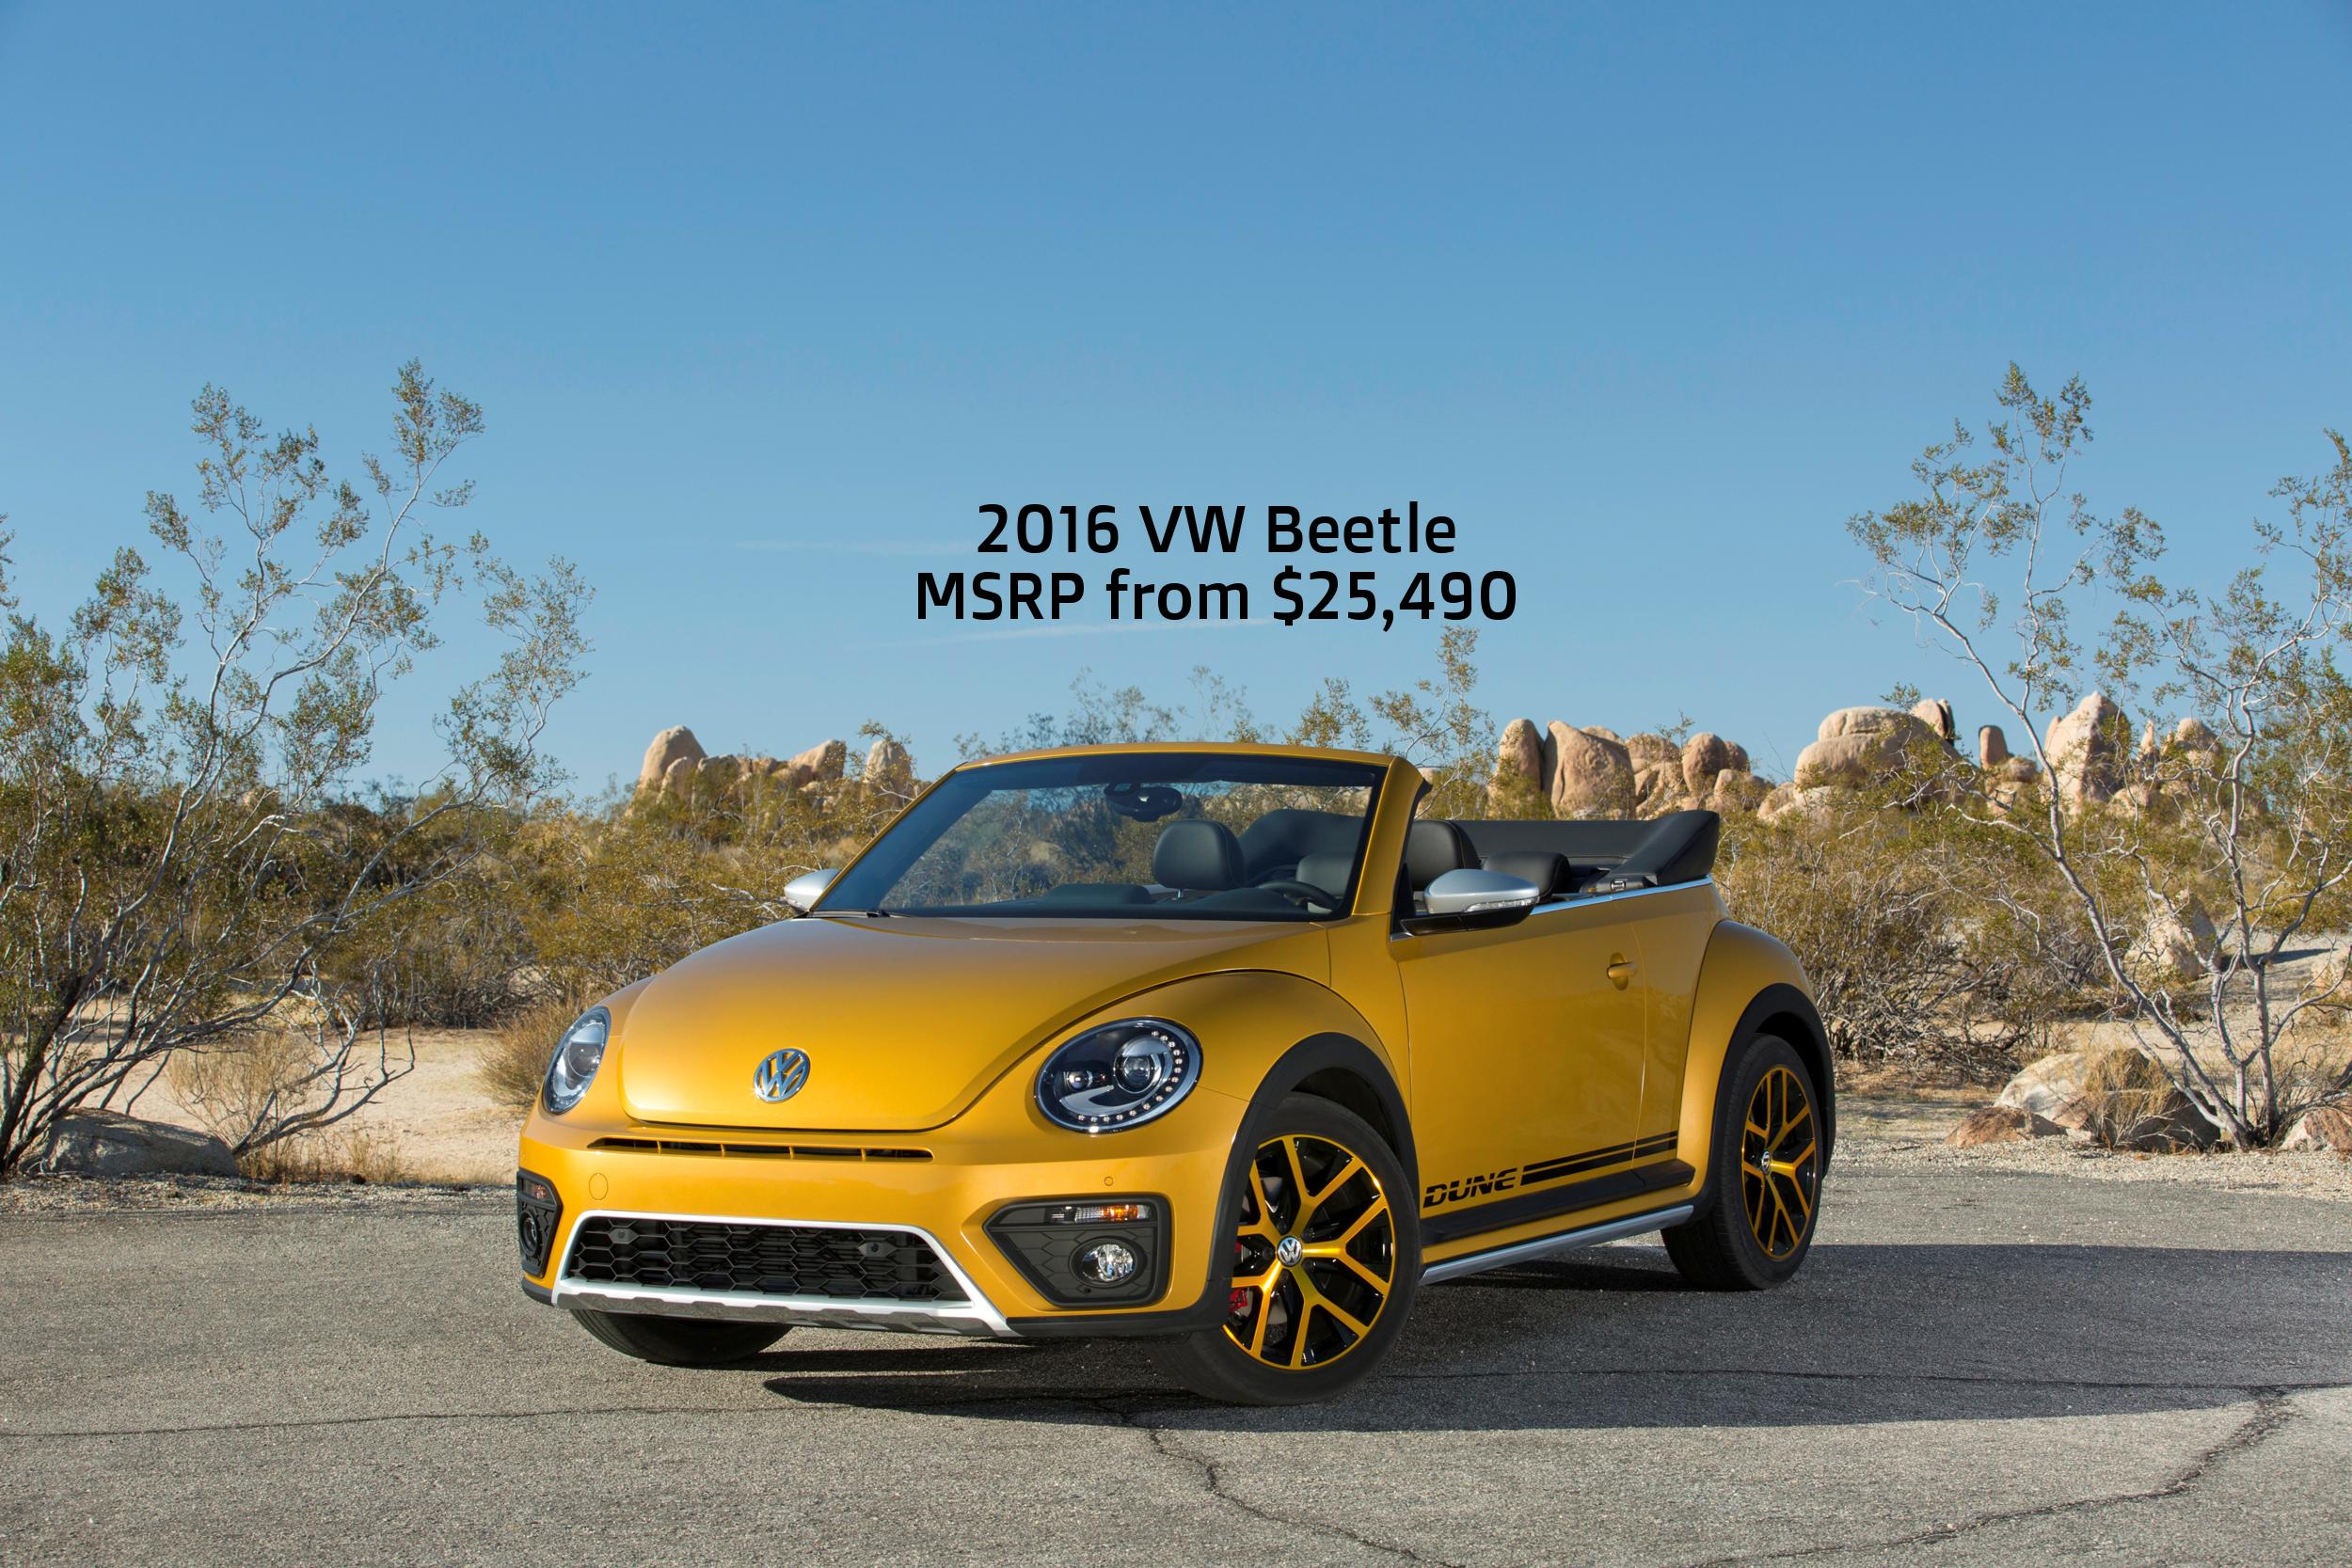 2016 VW BEETLE CONV.png